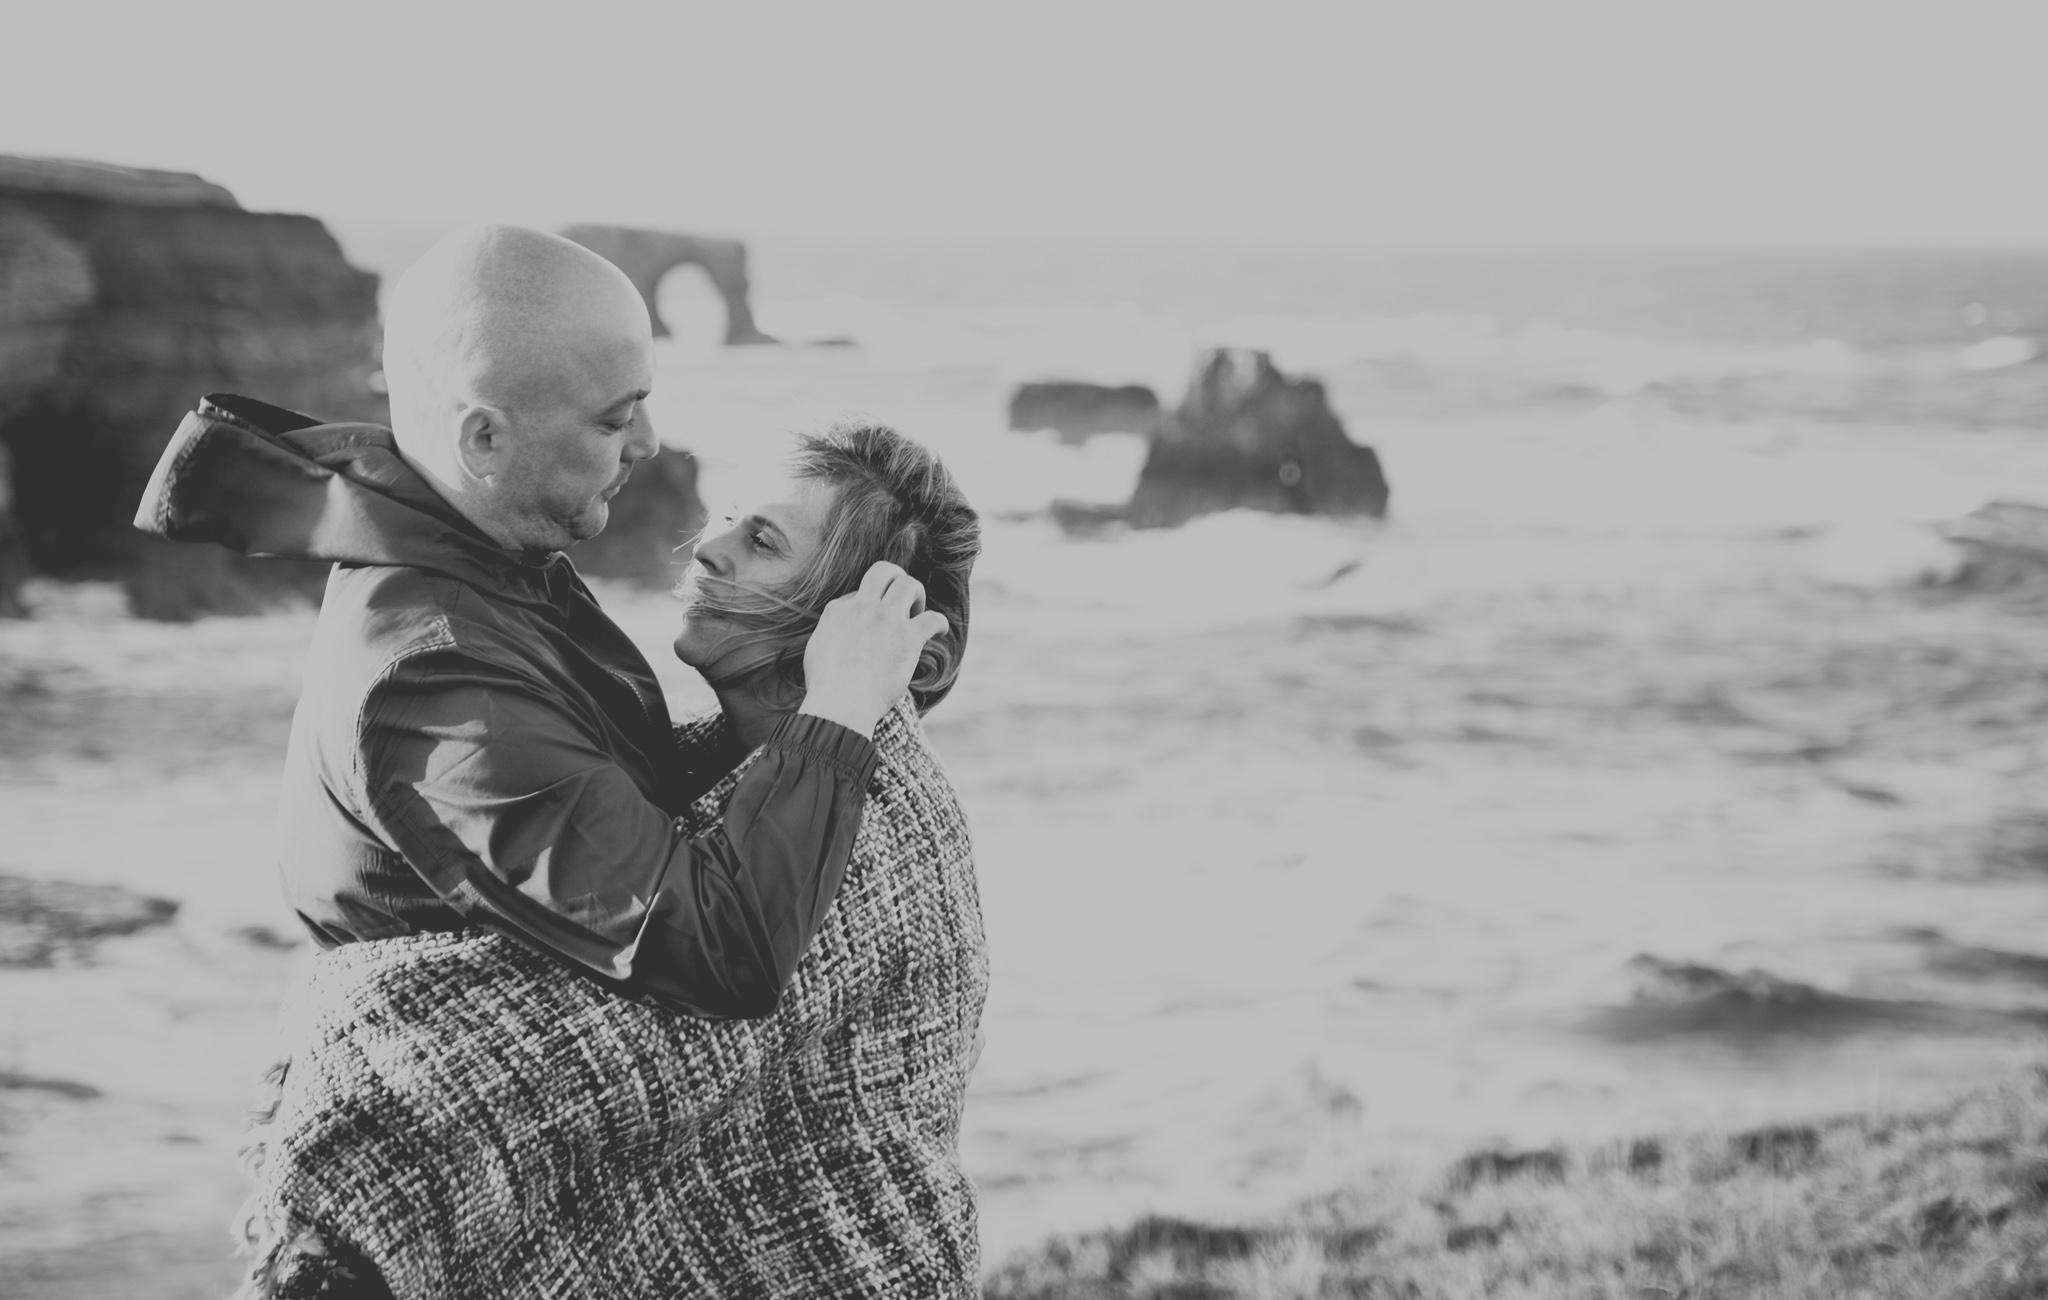 Chris and Bev | Aaron jeffels Photography | Sunderland Wedding Photography